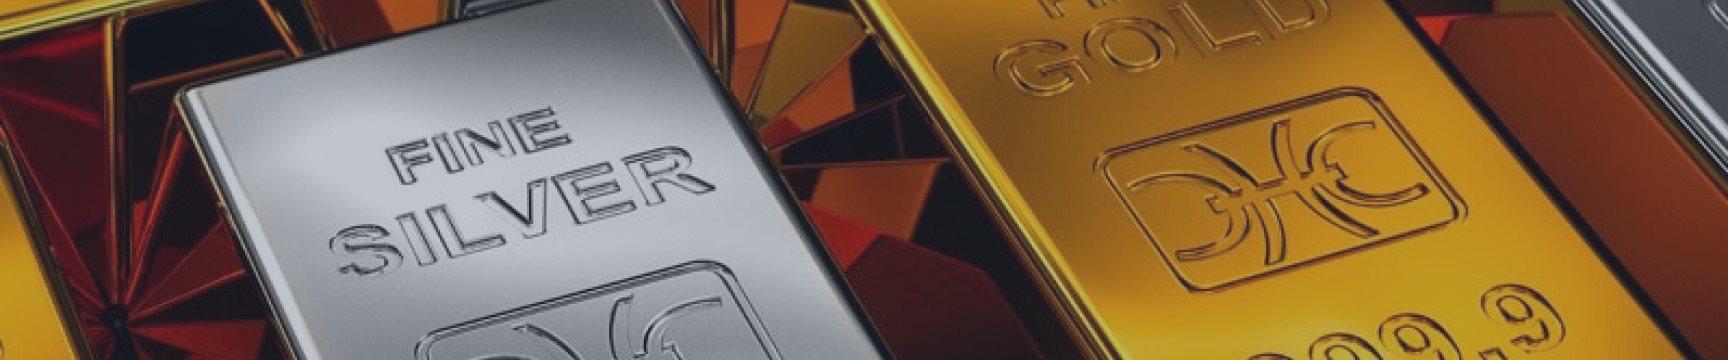 Металлы: Золото, серебро, платина